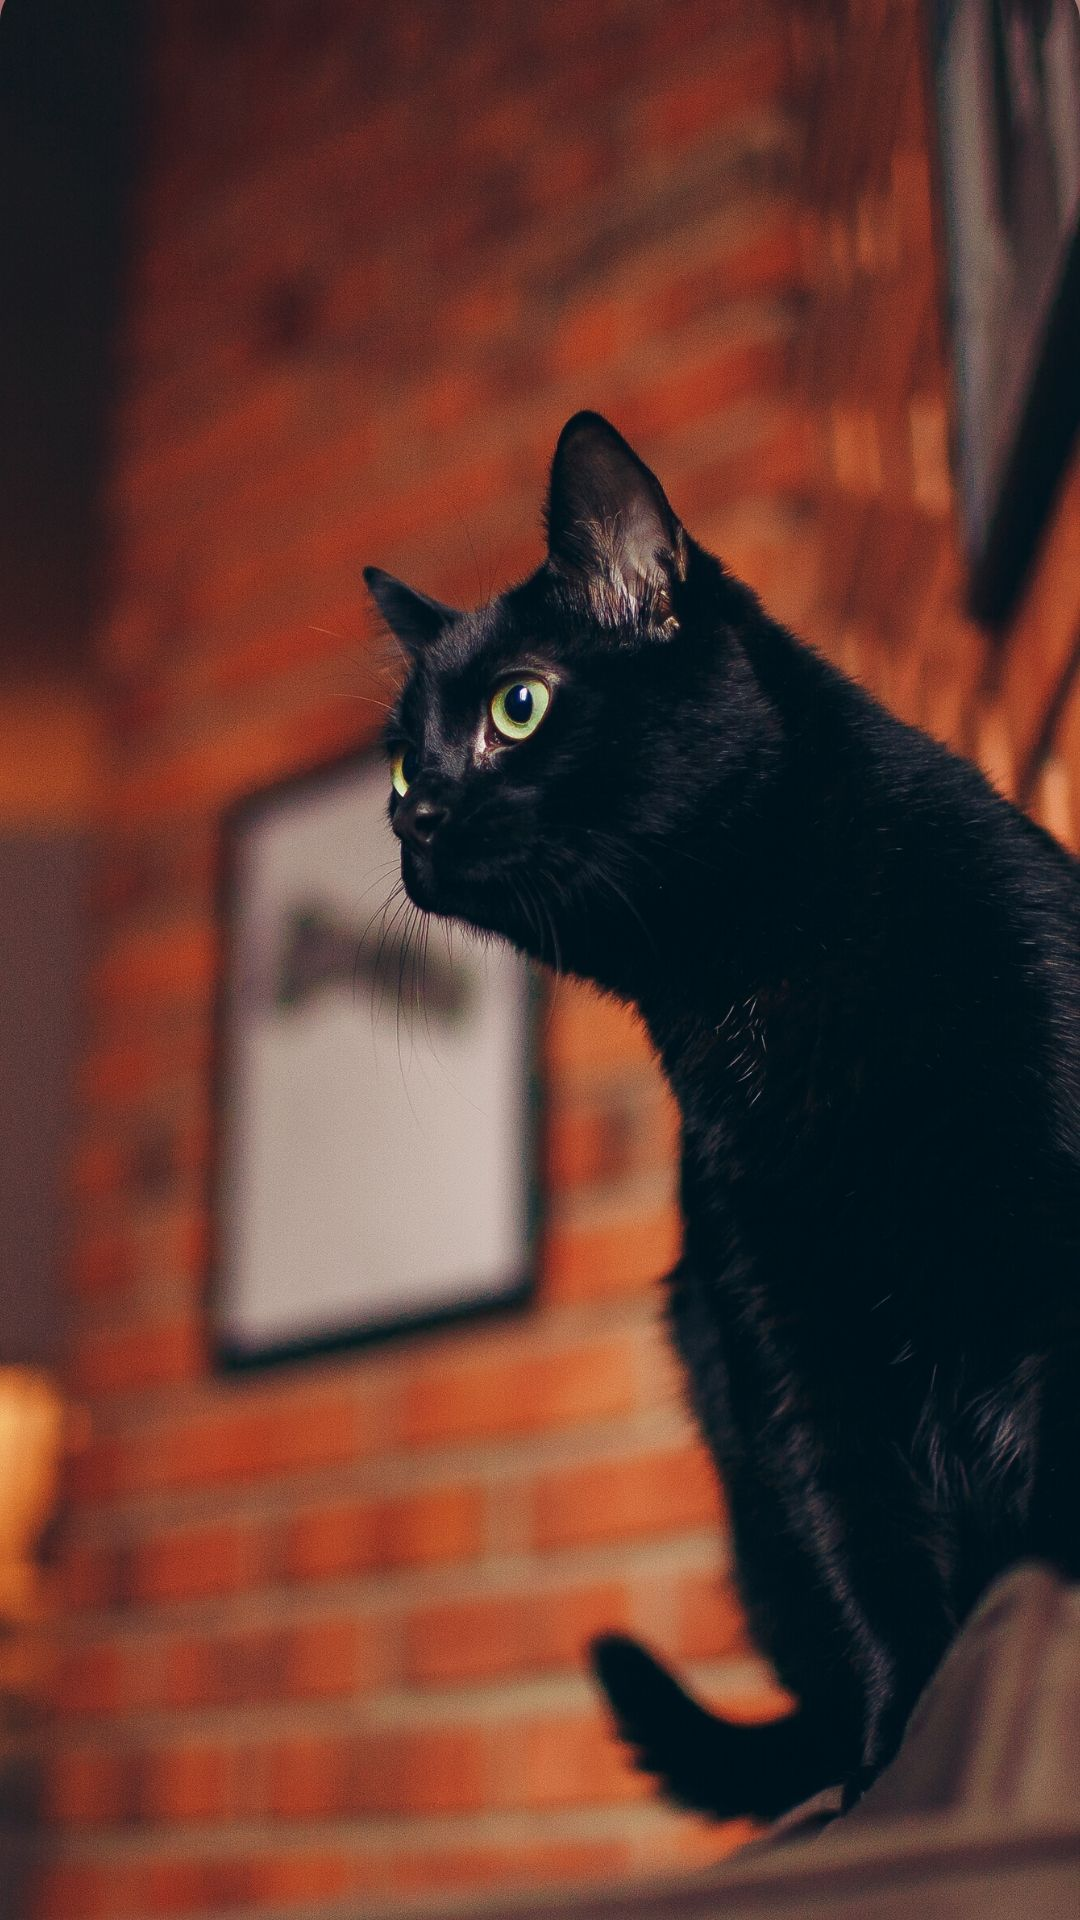 Black Cat Wallpaper For Iphone I Photograph Black Black Cats In 2020 Cat Wallpaper Black Cat Aesthetic Cute Cat Wallpaper